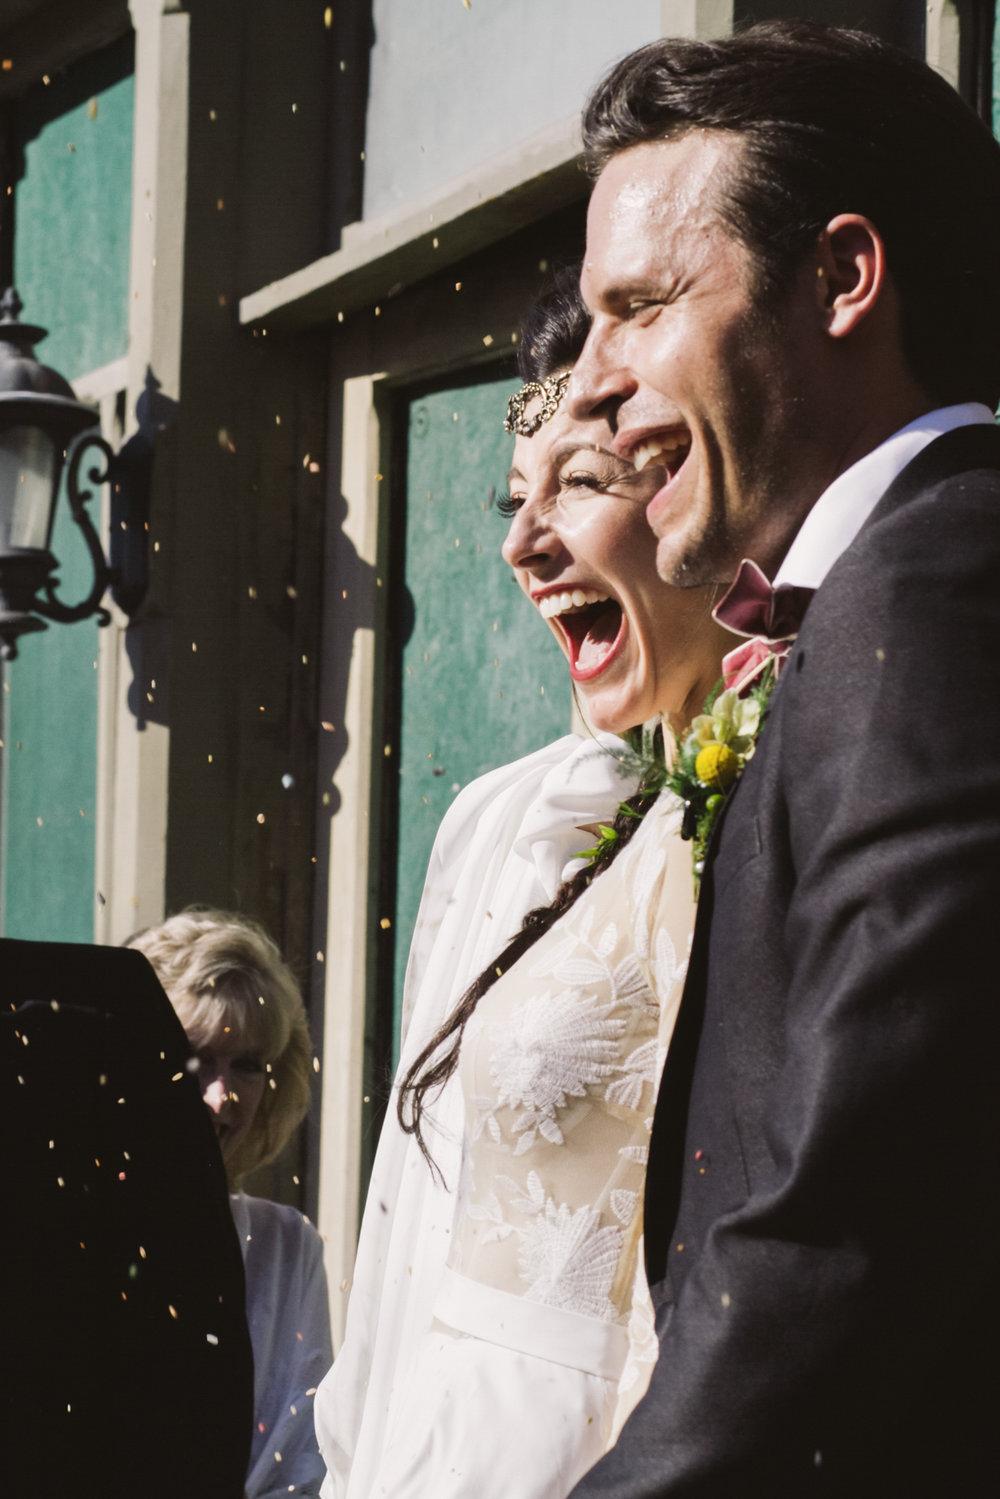 Kimberly-Coccagnia-Wedding-Photographer-112.JPG